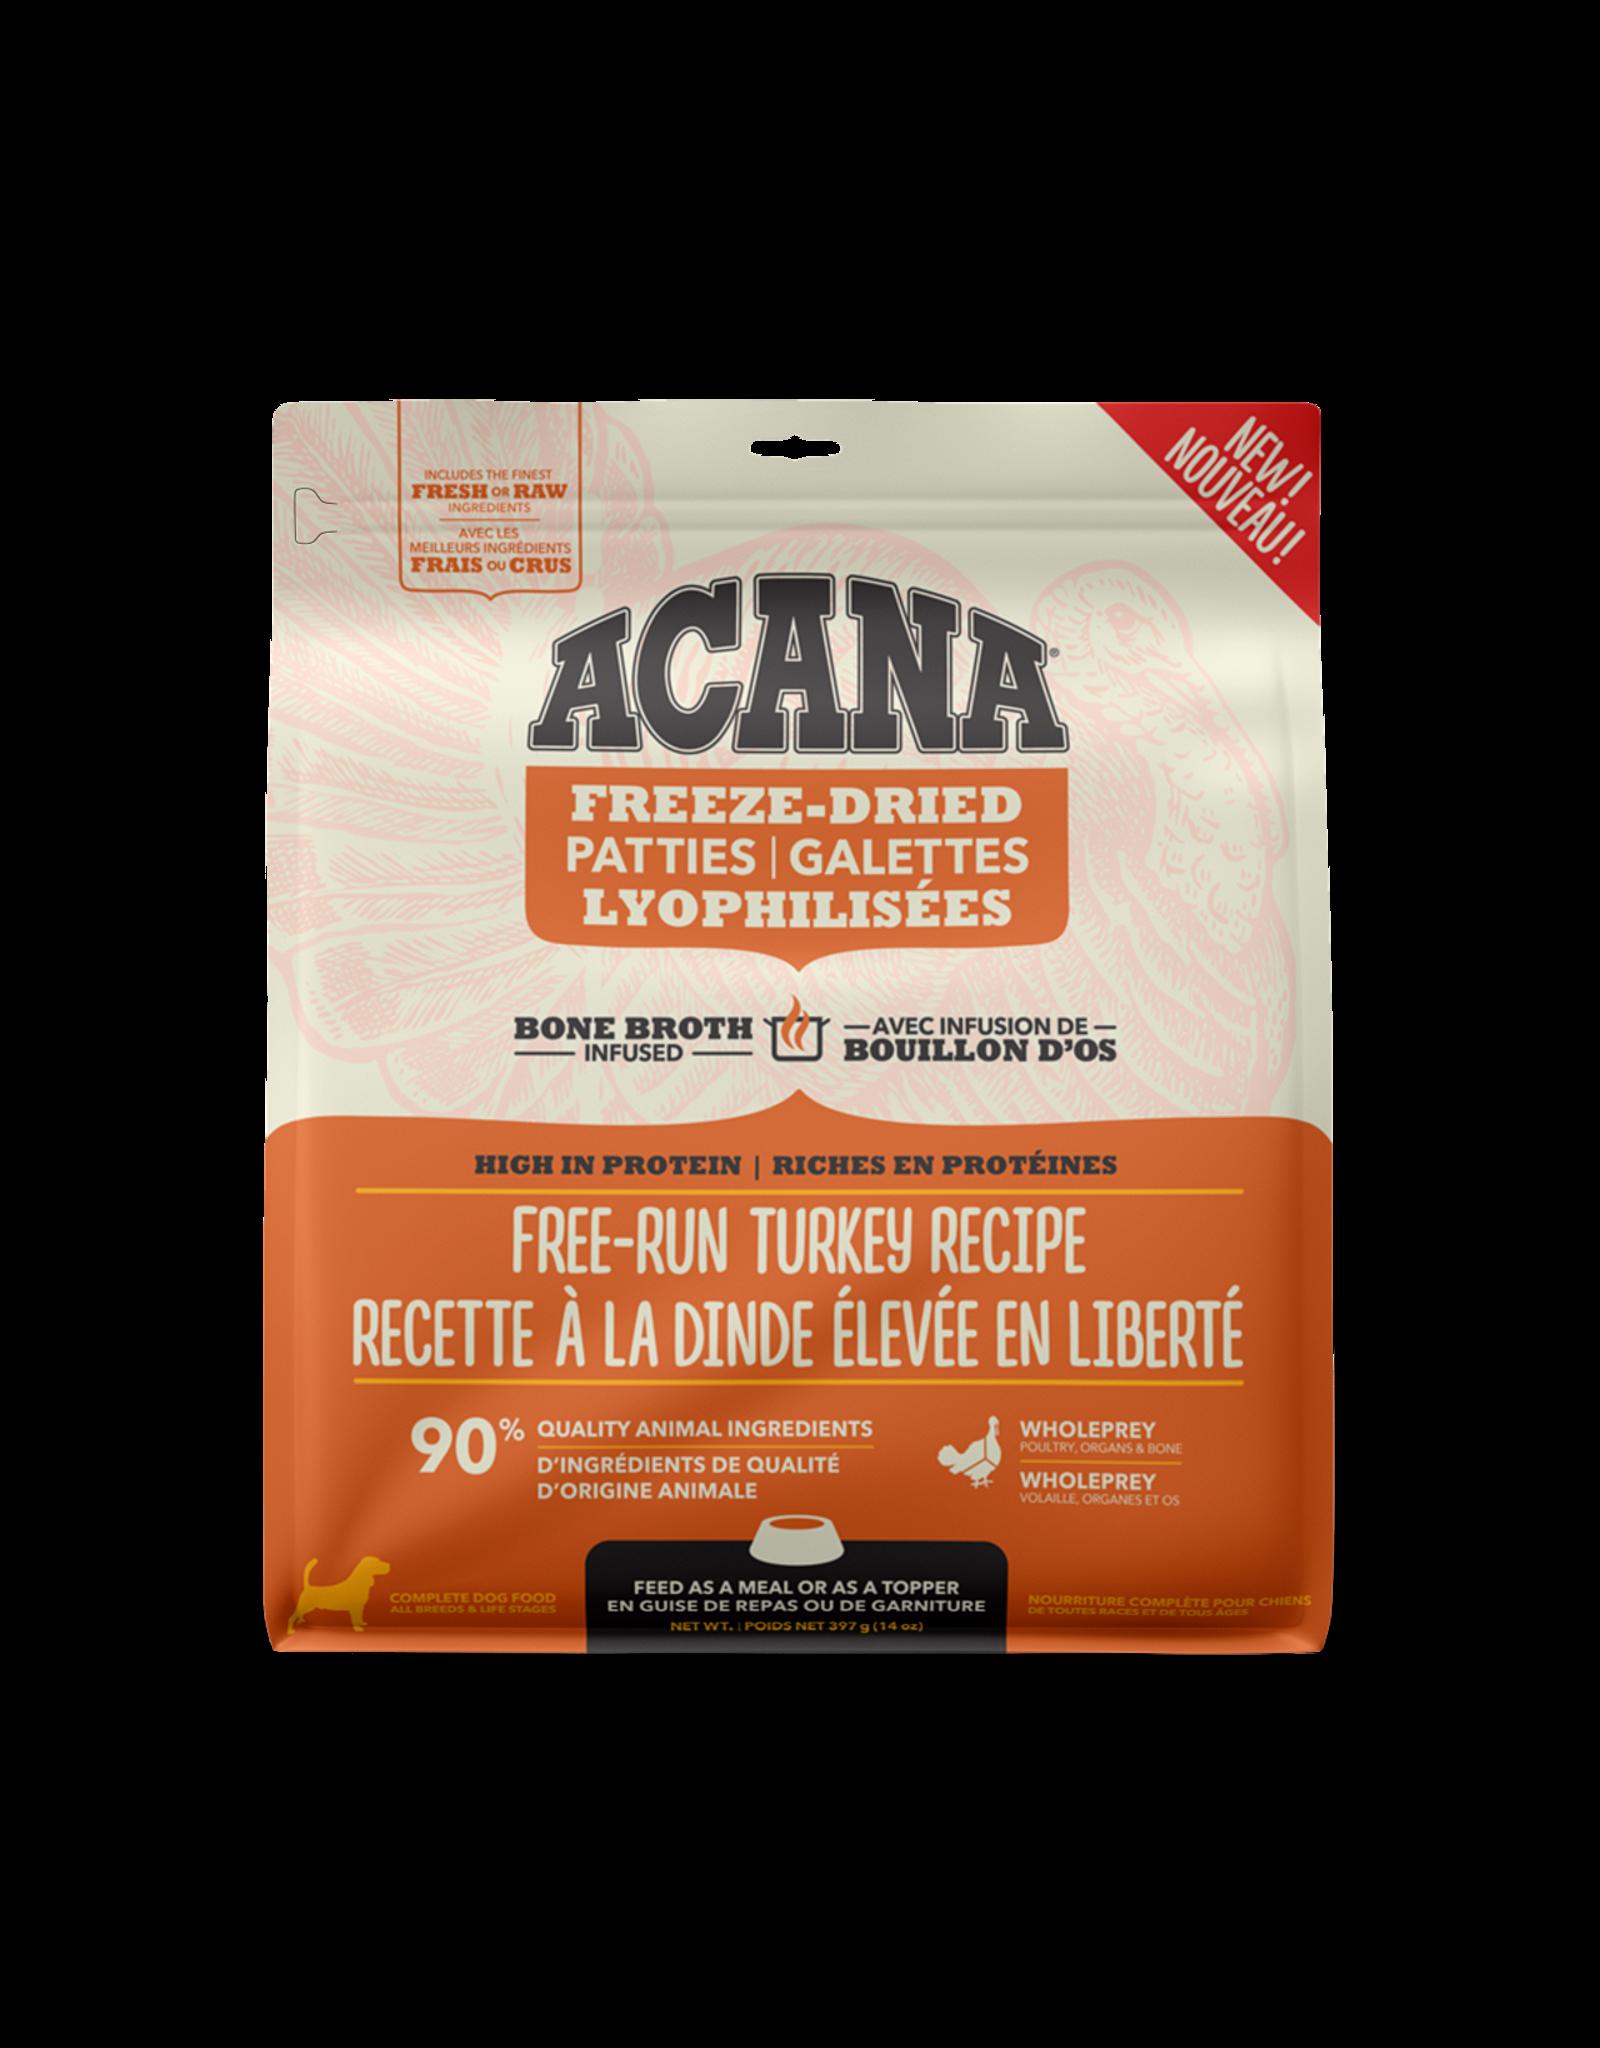 ACANA Acana Freeze-Dried Food - Free-Run Turkey Recipe - Patties 397g